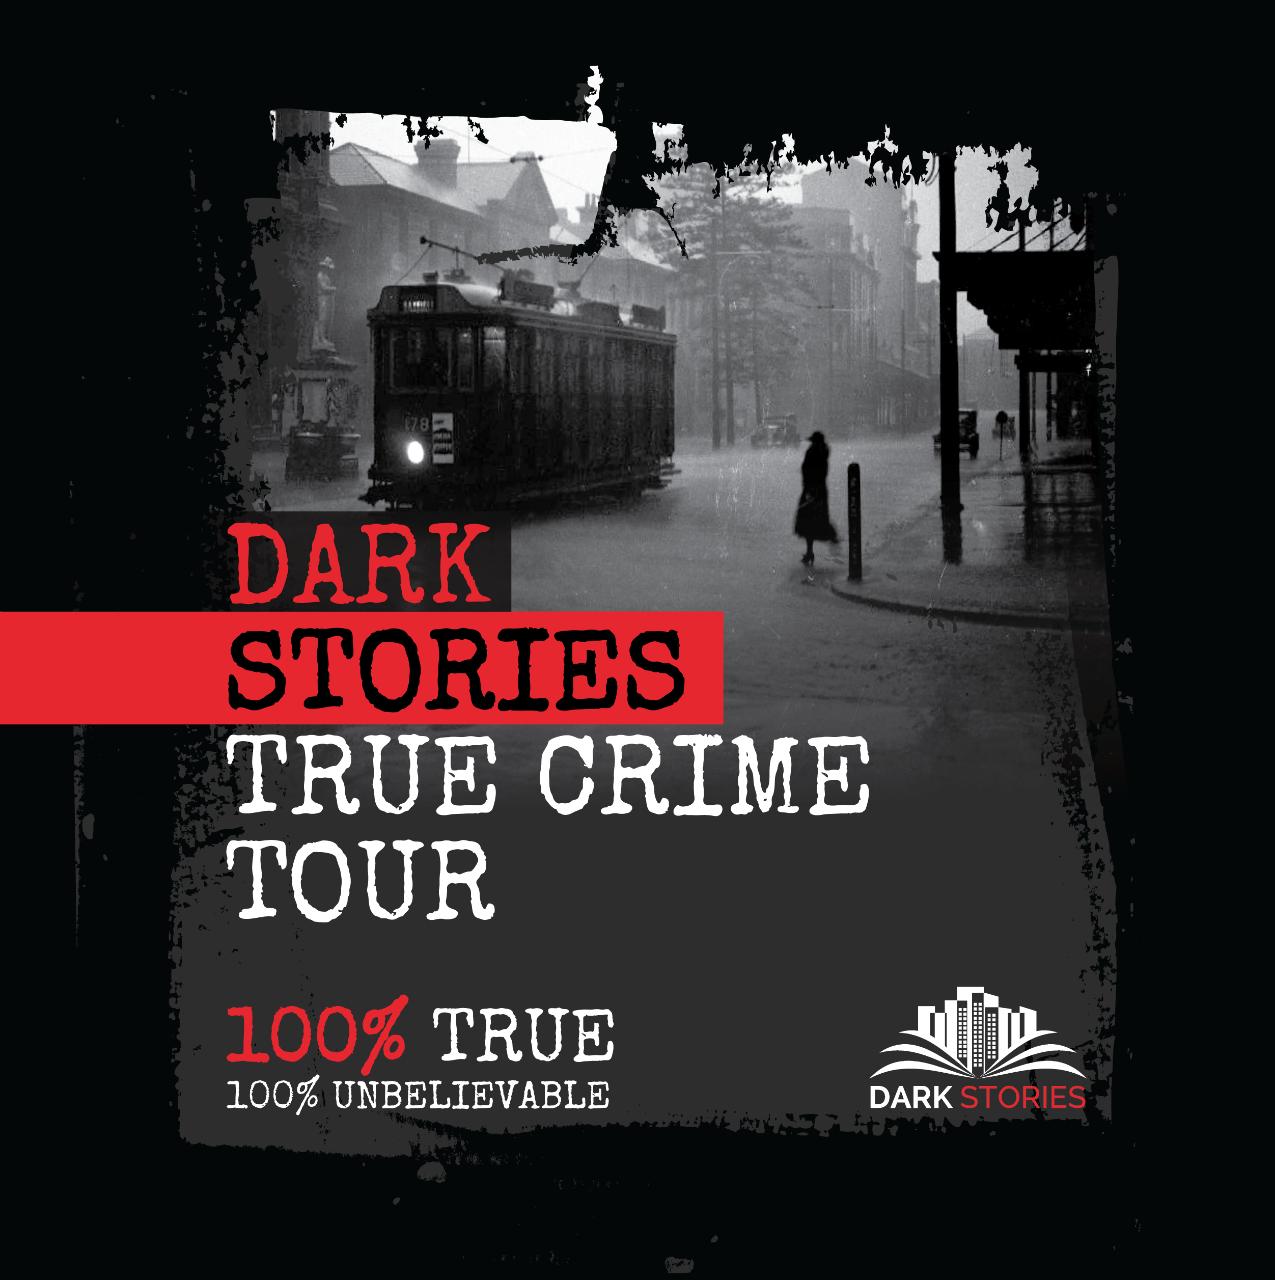 Dark Stories True Crime Private Tour